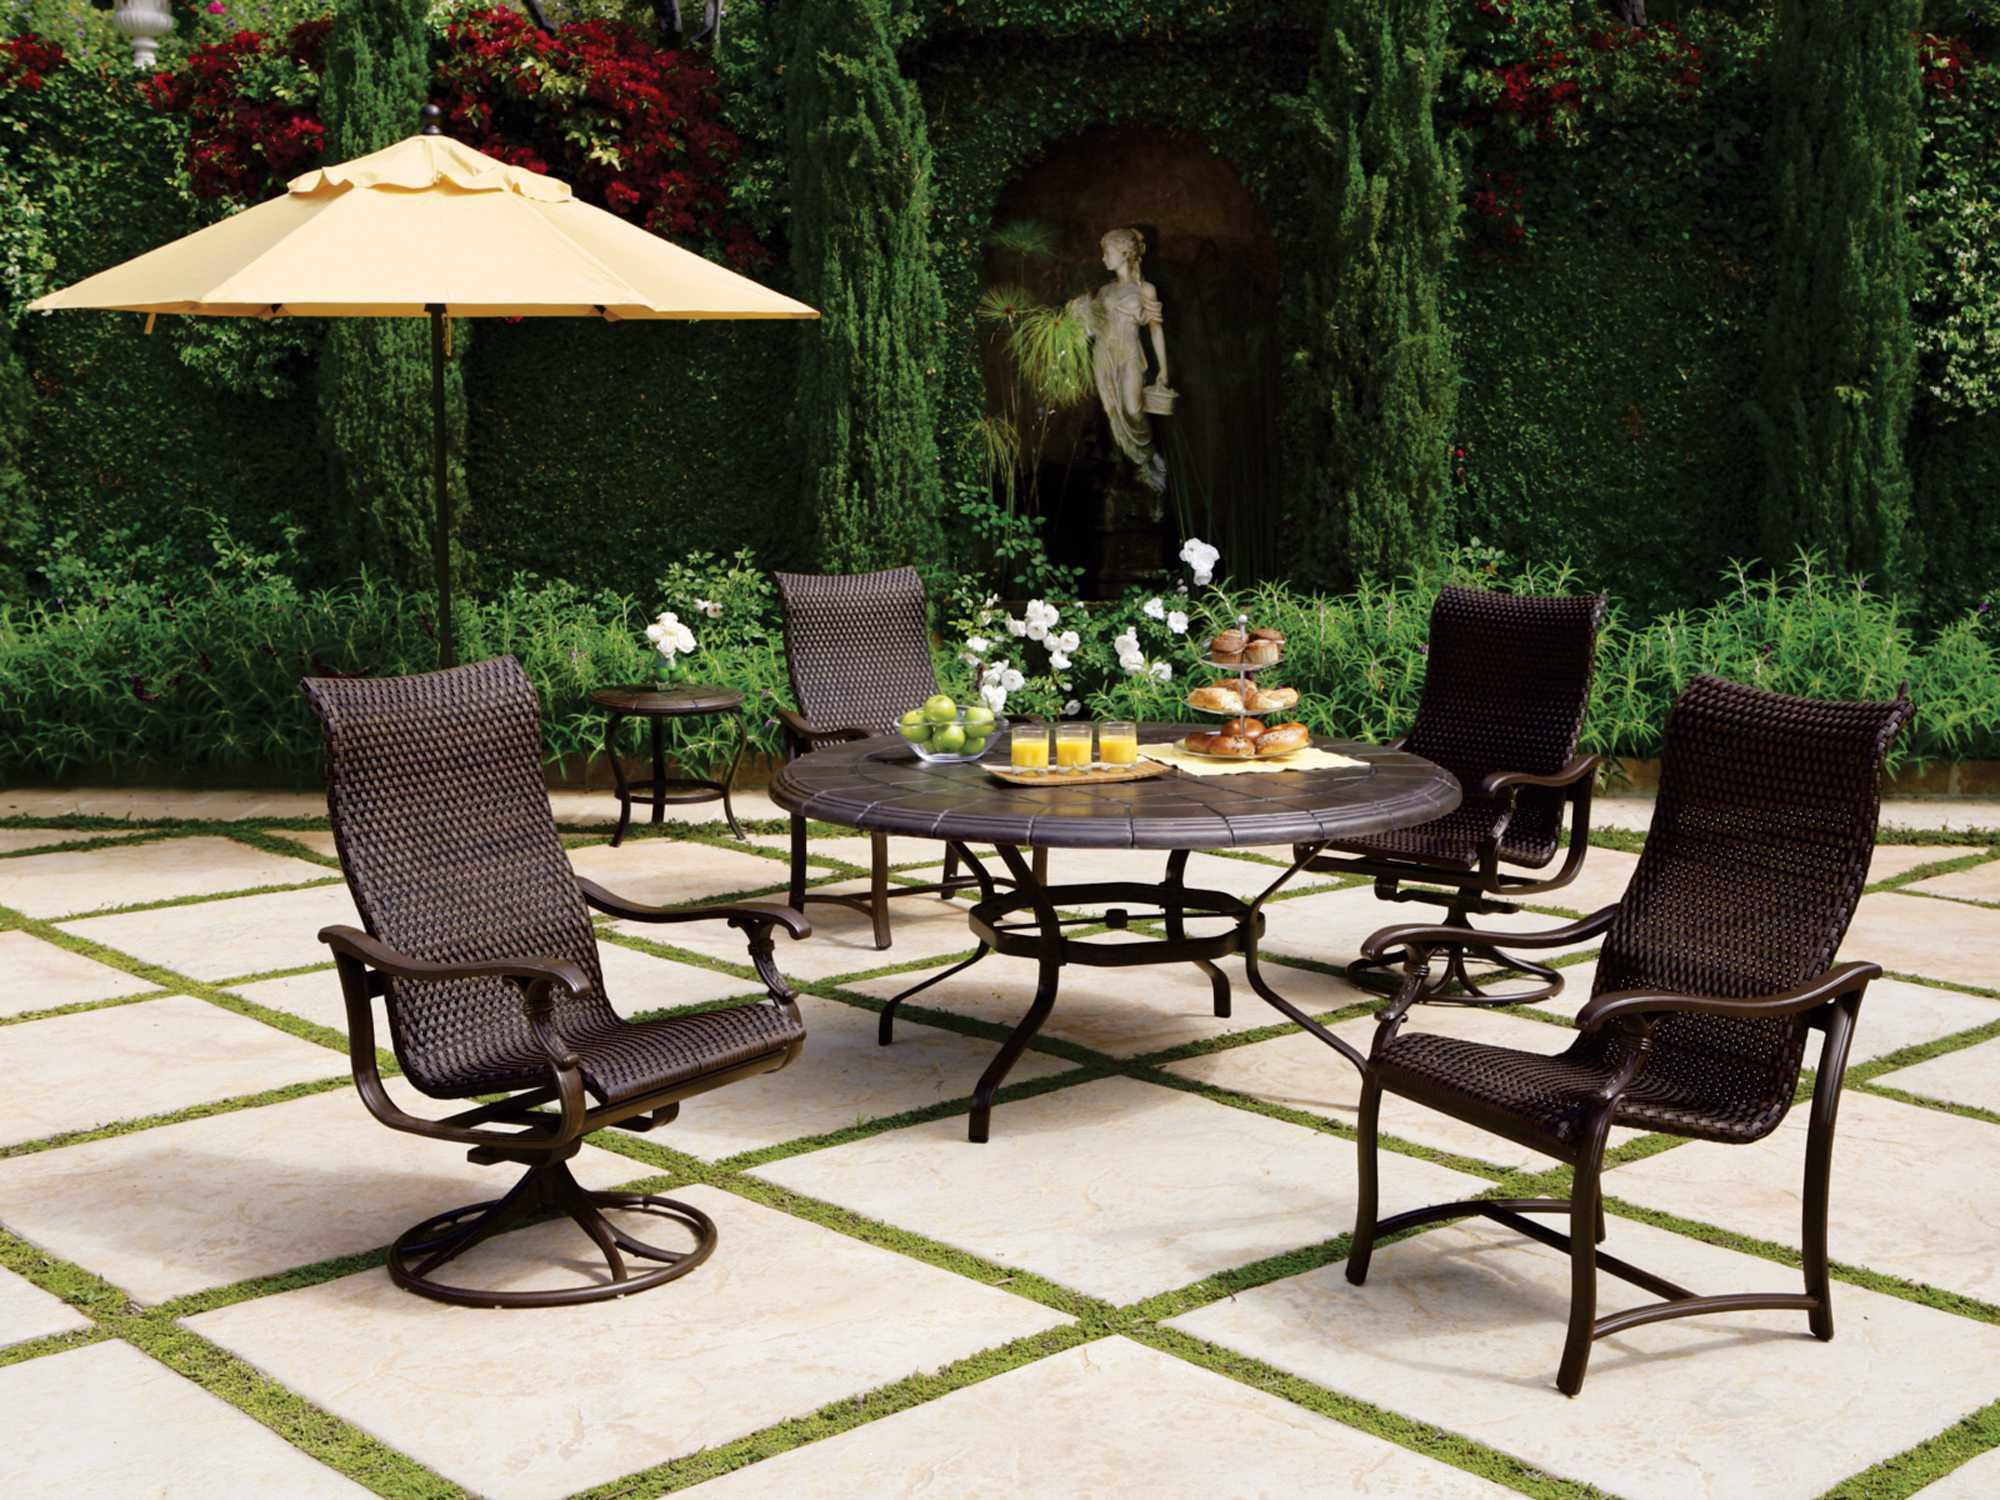 Tropitone Ravello Woven Swivel Rocker Dining Chair WS - Tropitone outdoor furniture